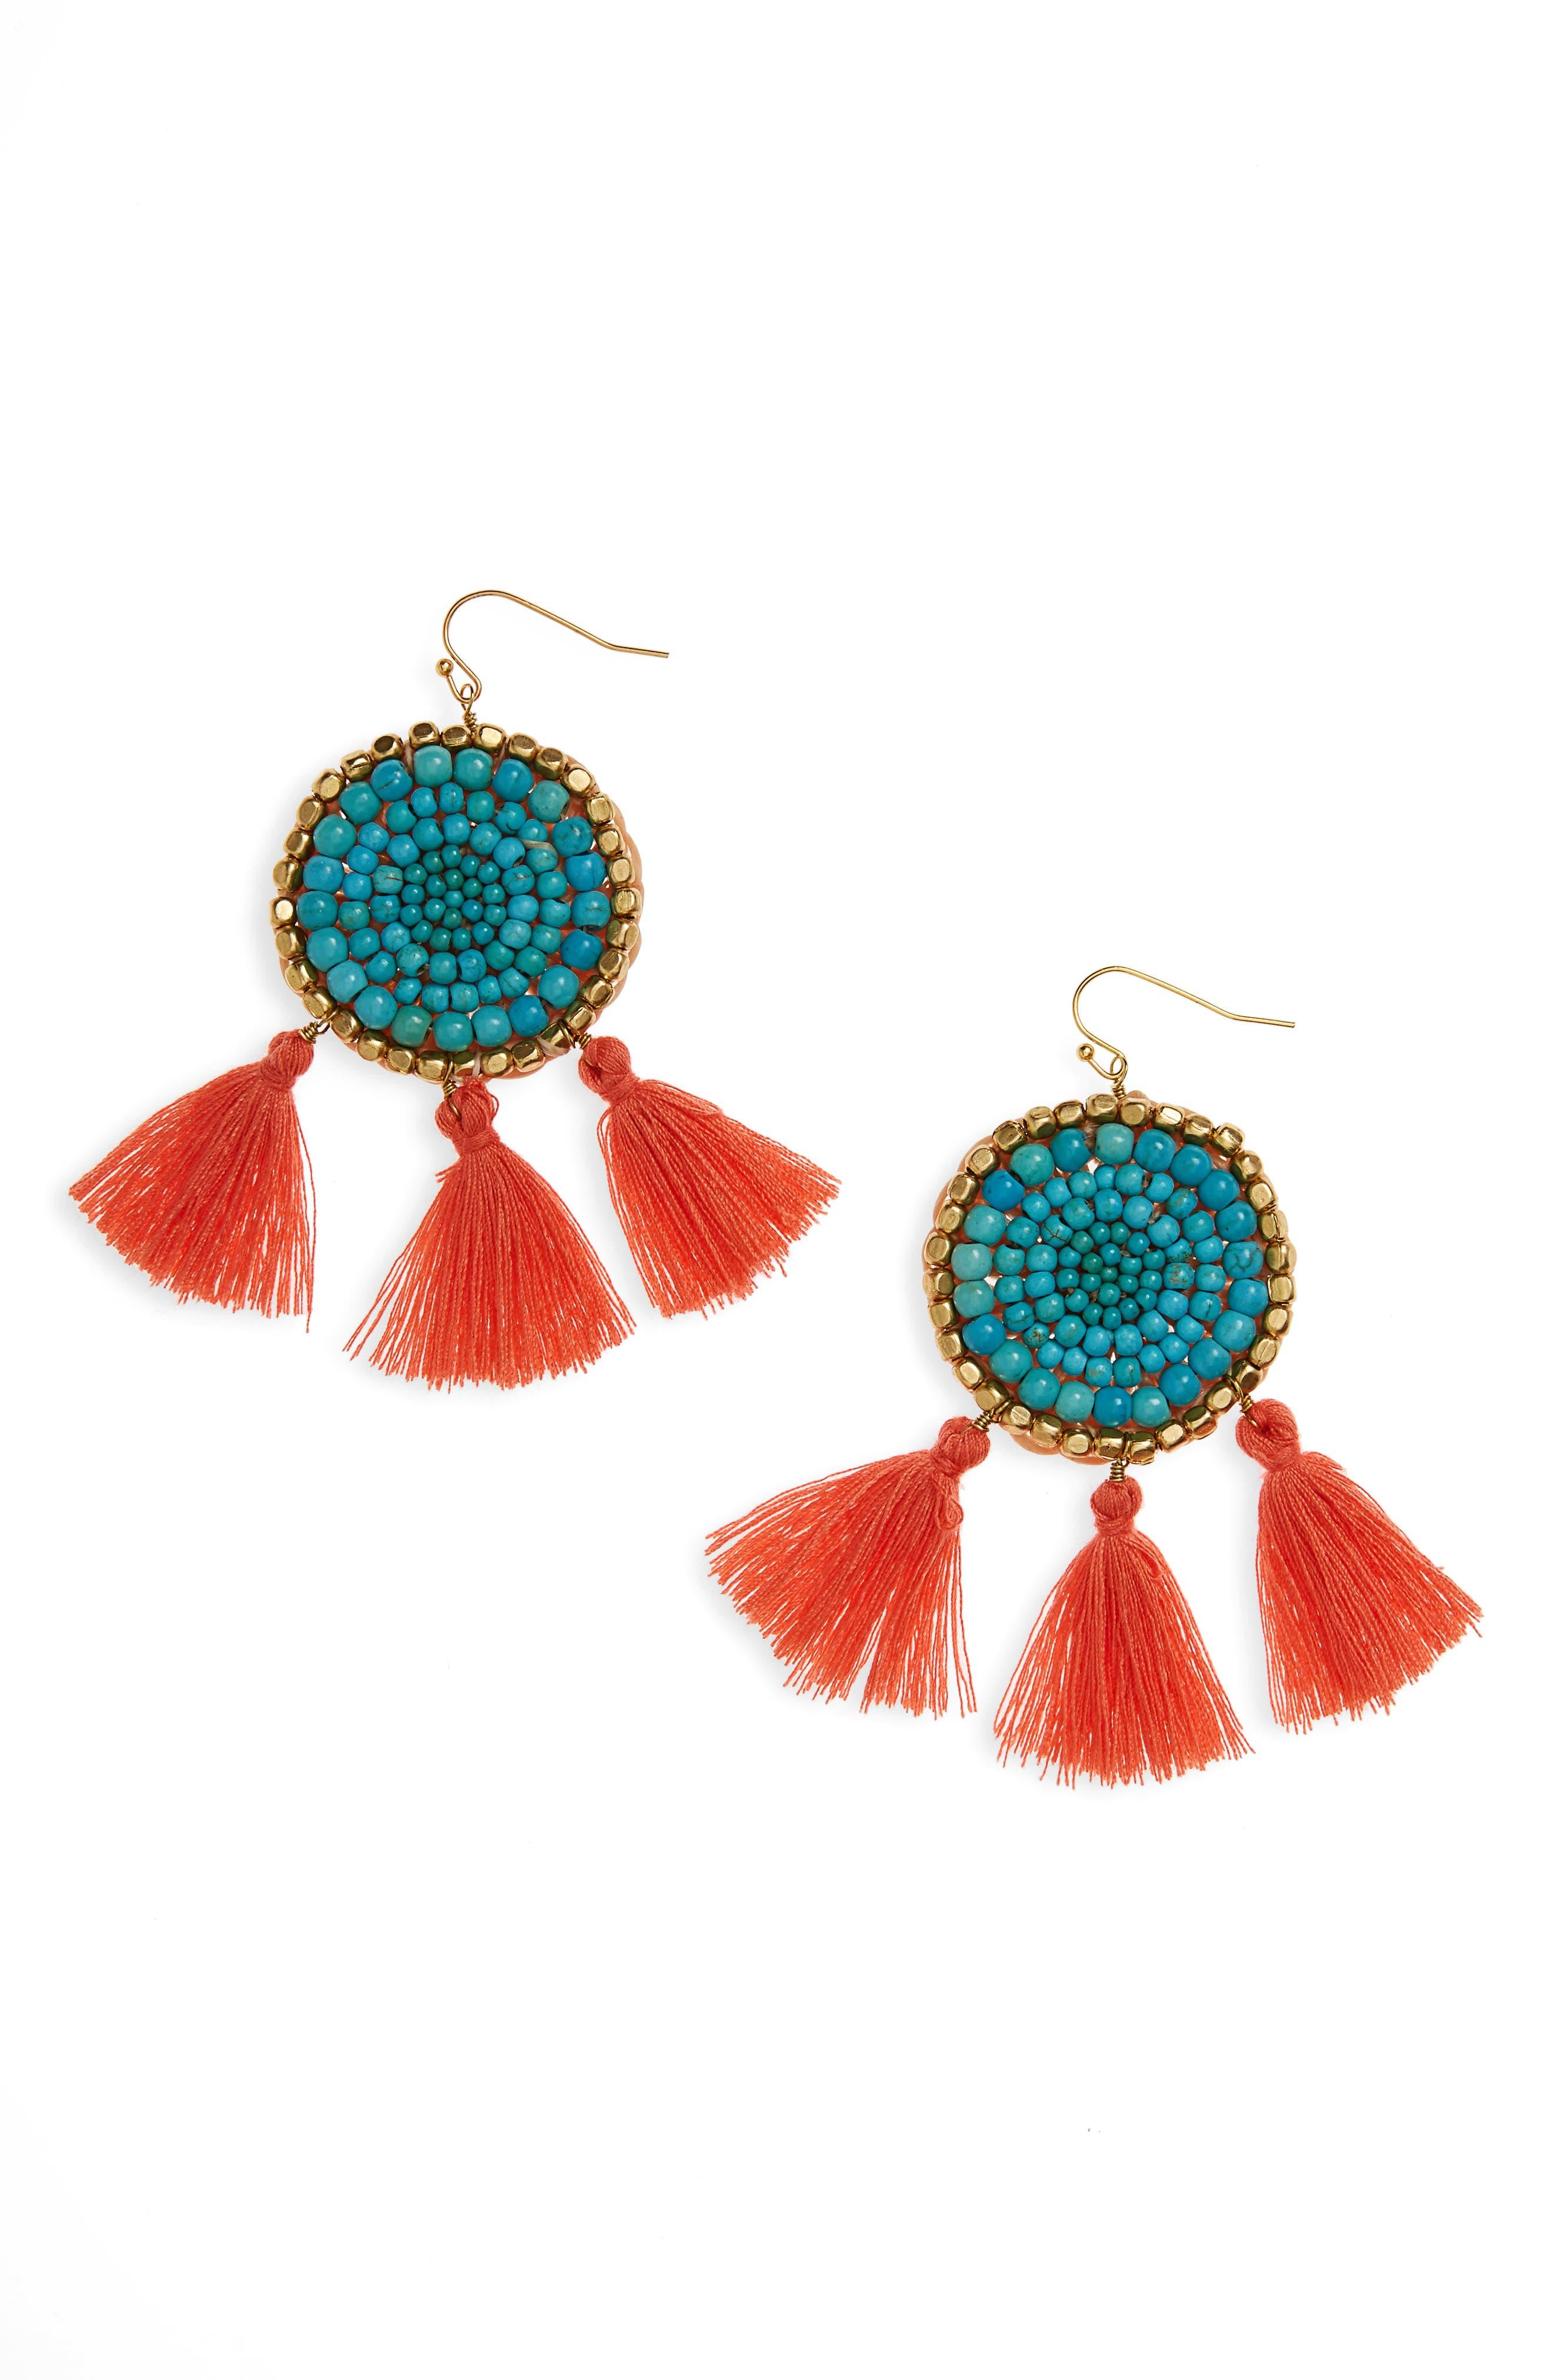 Panacea Howlite Medallion Tassel Earrings